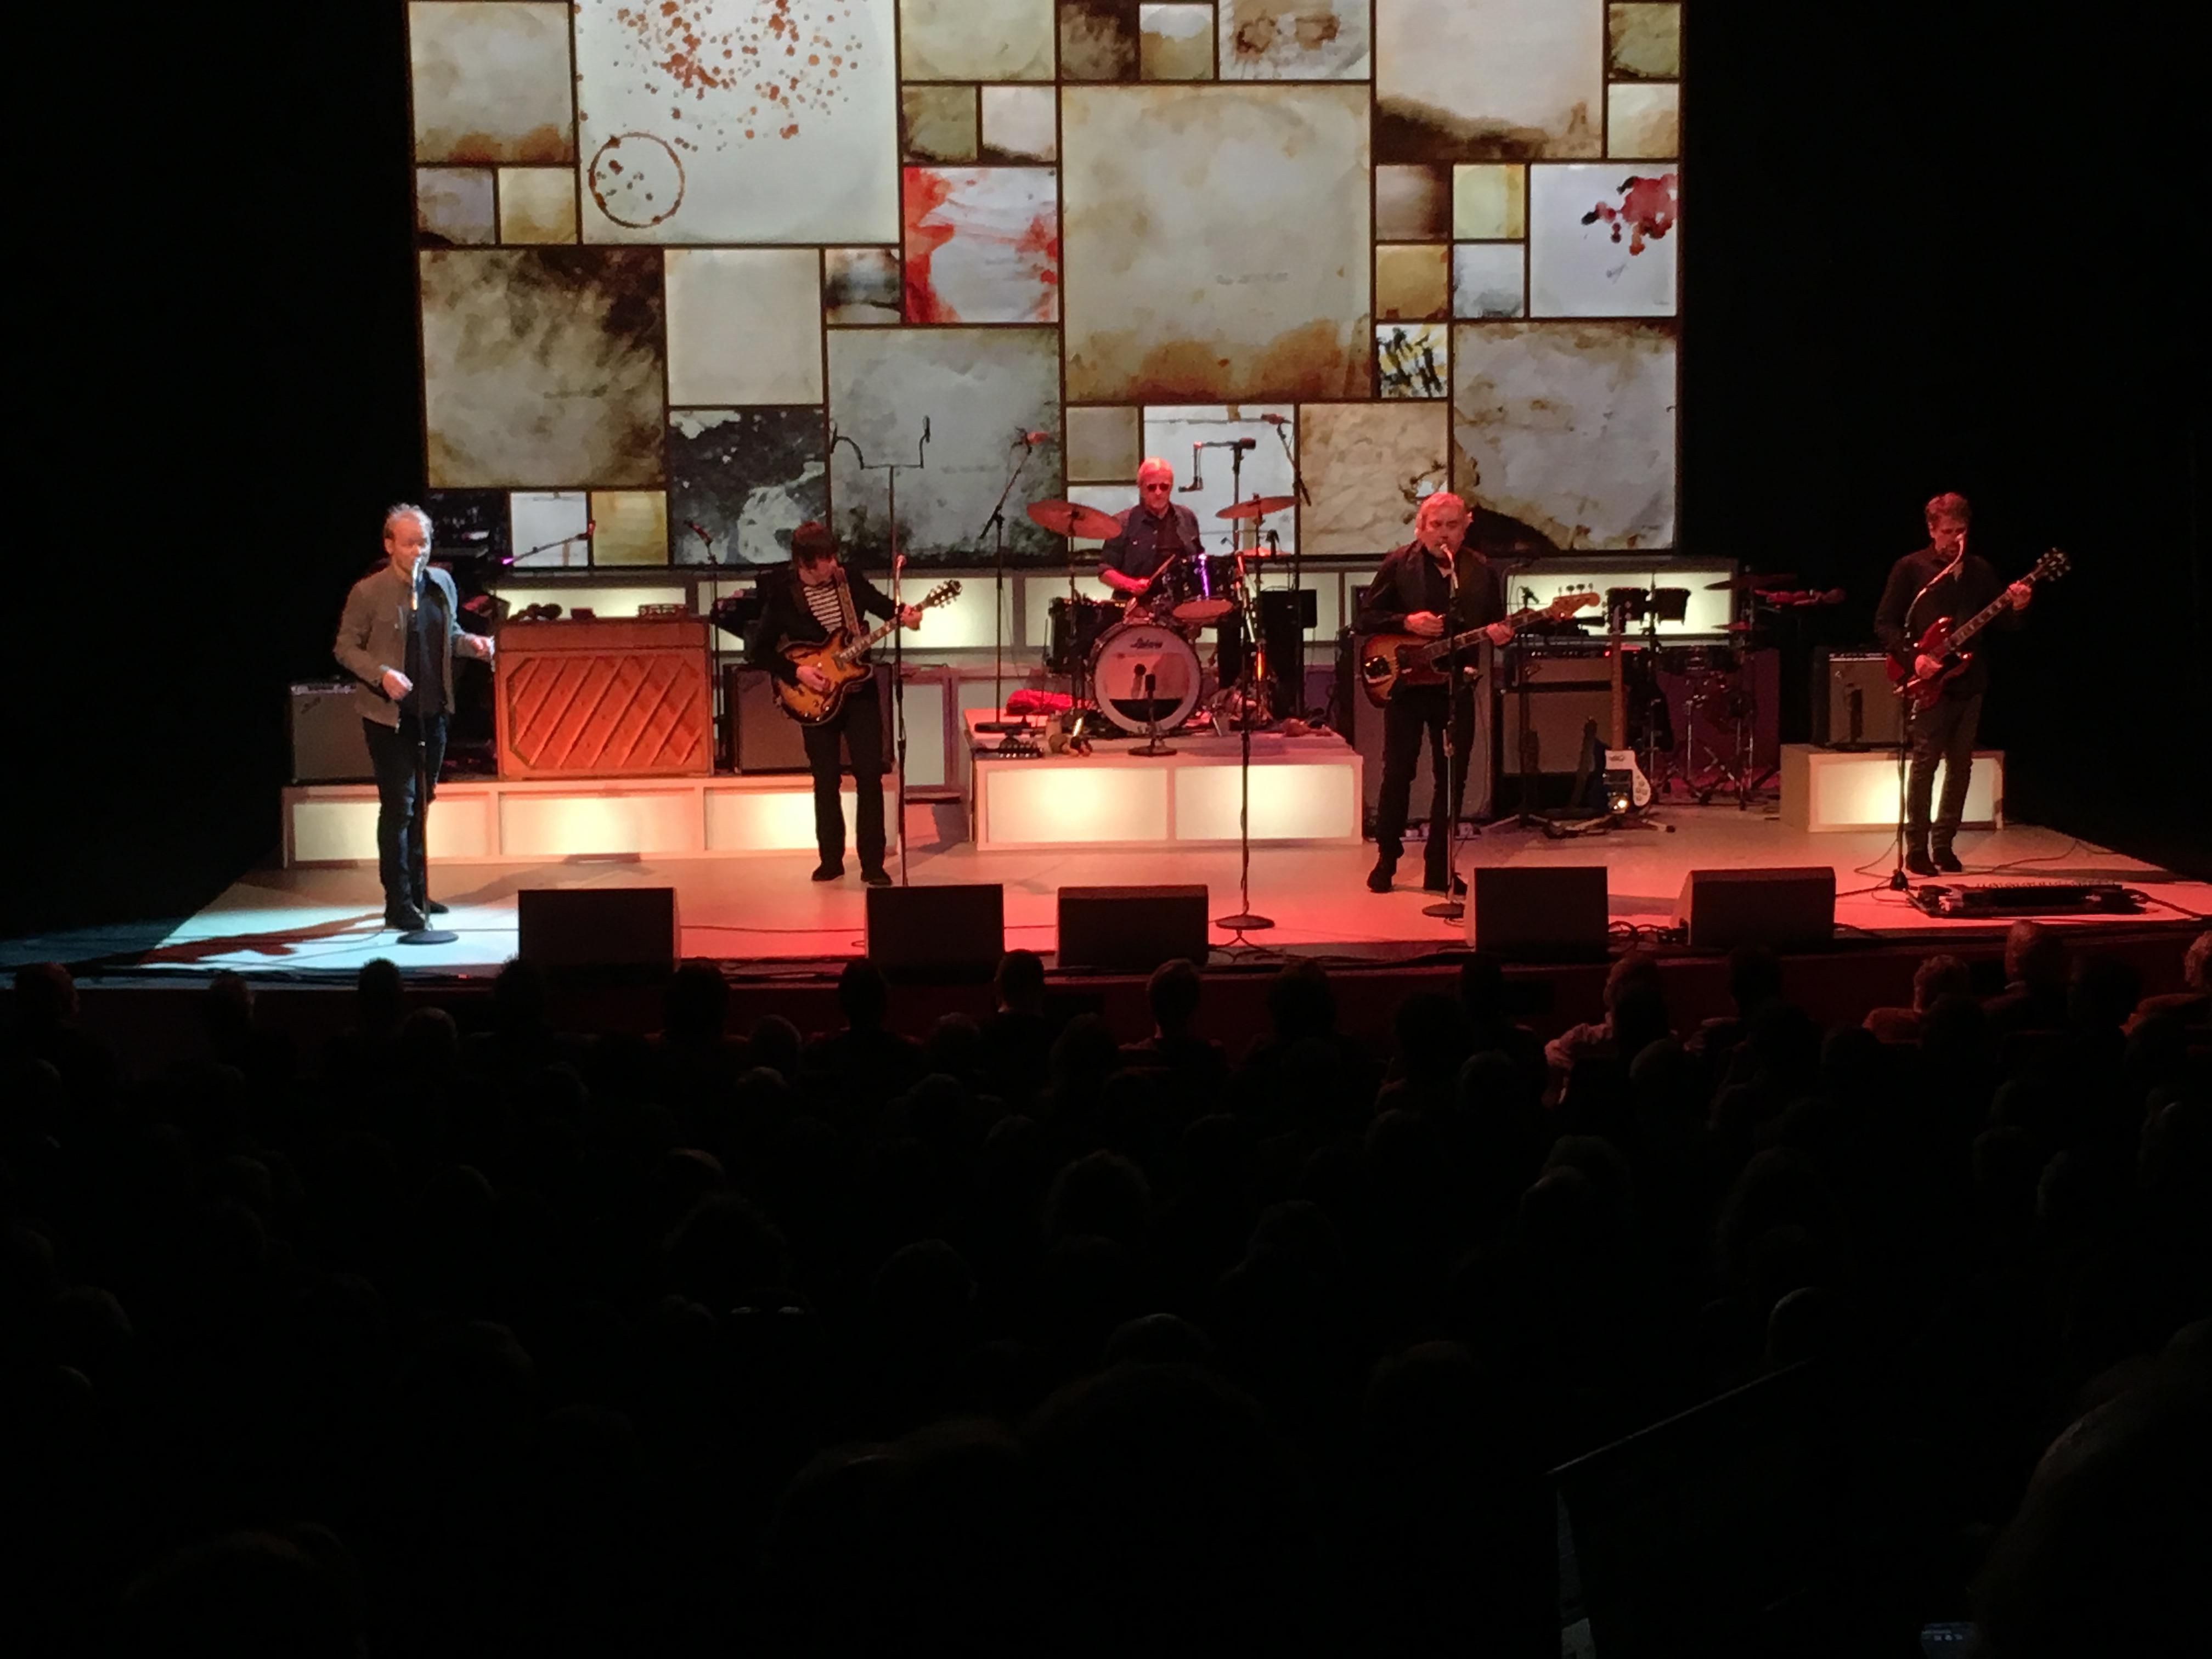 Concertreview: The Analogues: veel meer dan een Beatles cover band